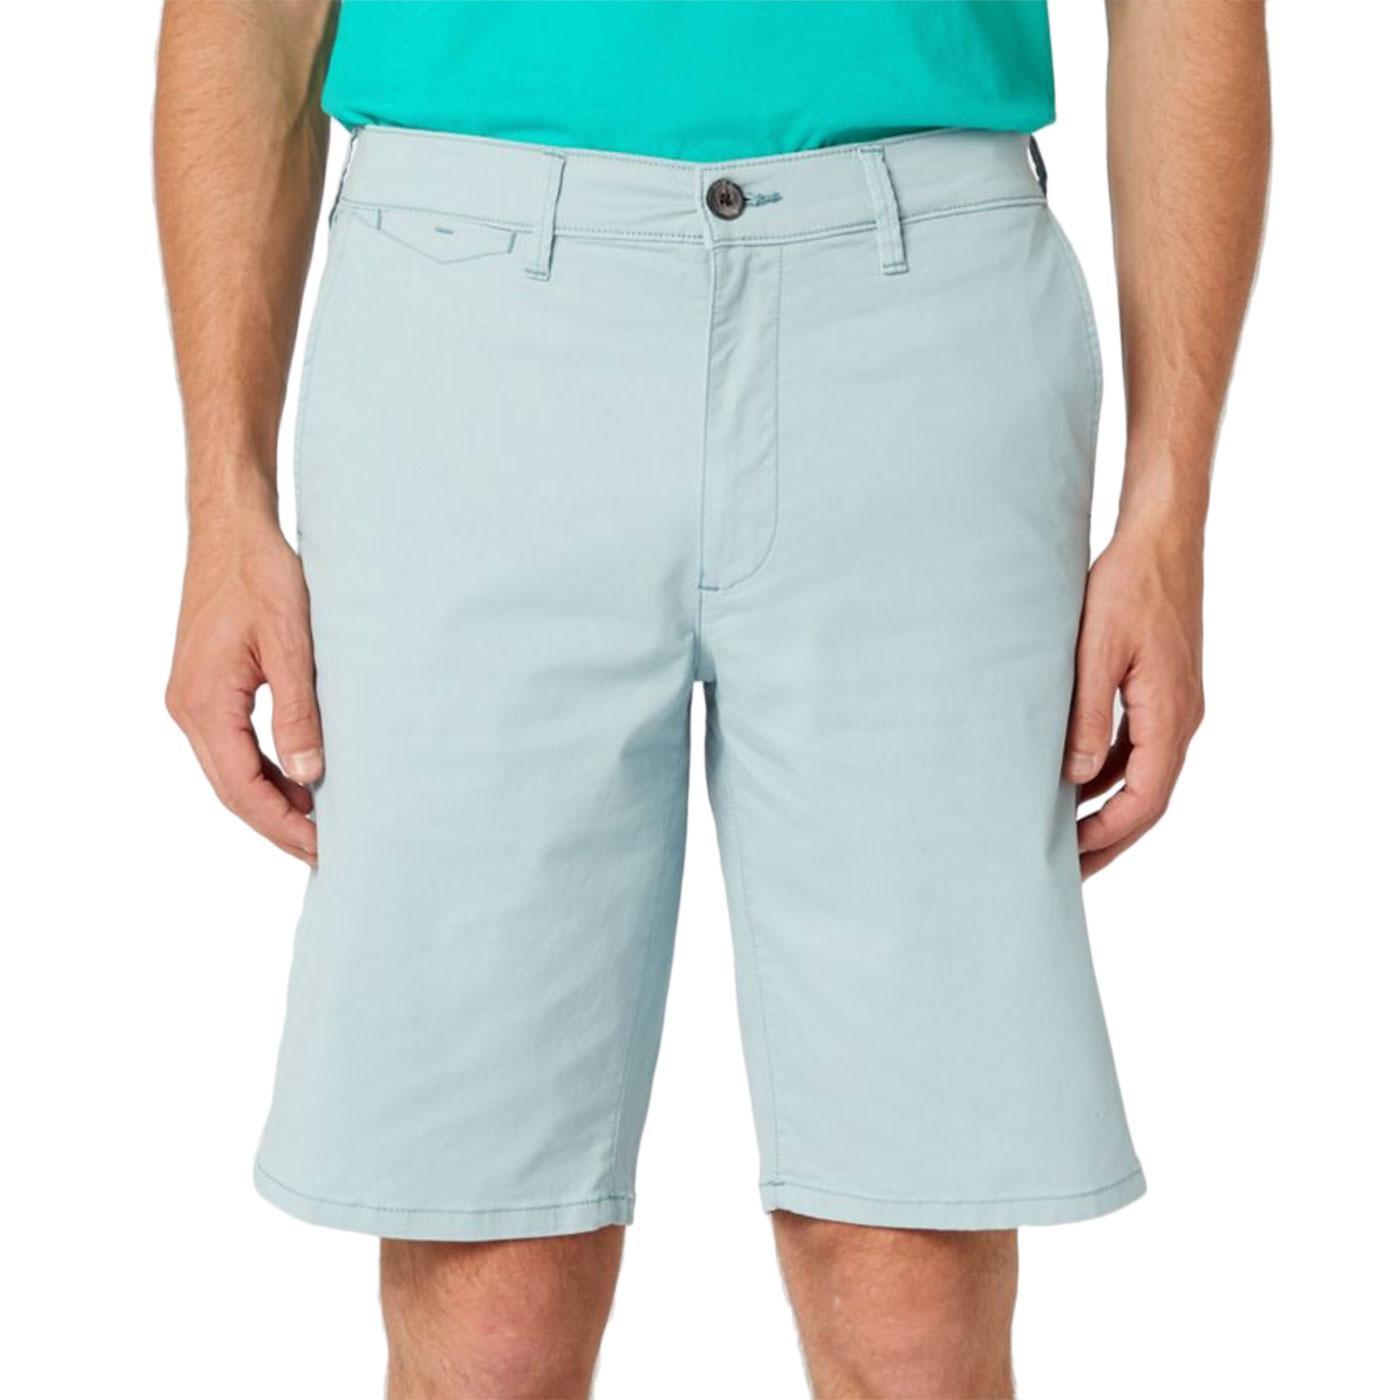 WRANGLER Men's Retro 4 Pocket Chino Shorts (Mist)